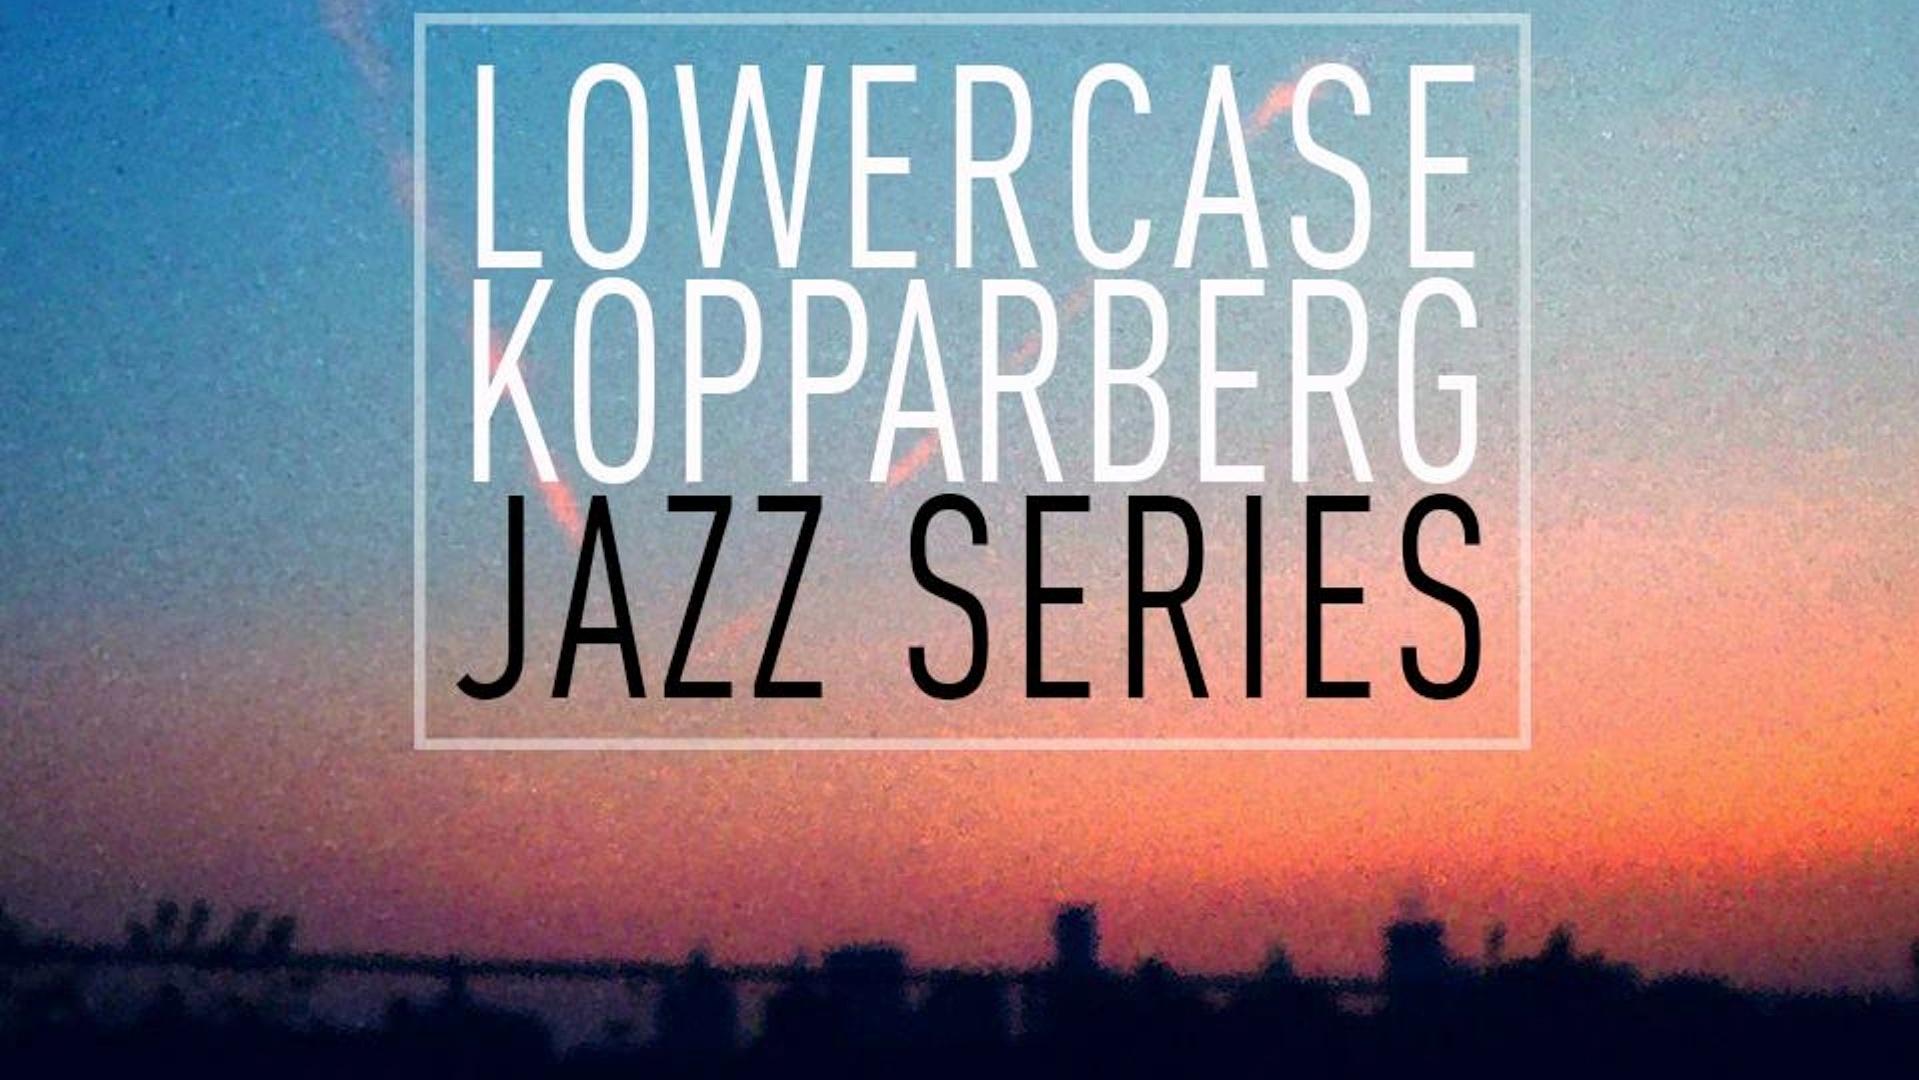 Lowercase Koppaberg Jazz Series #8